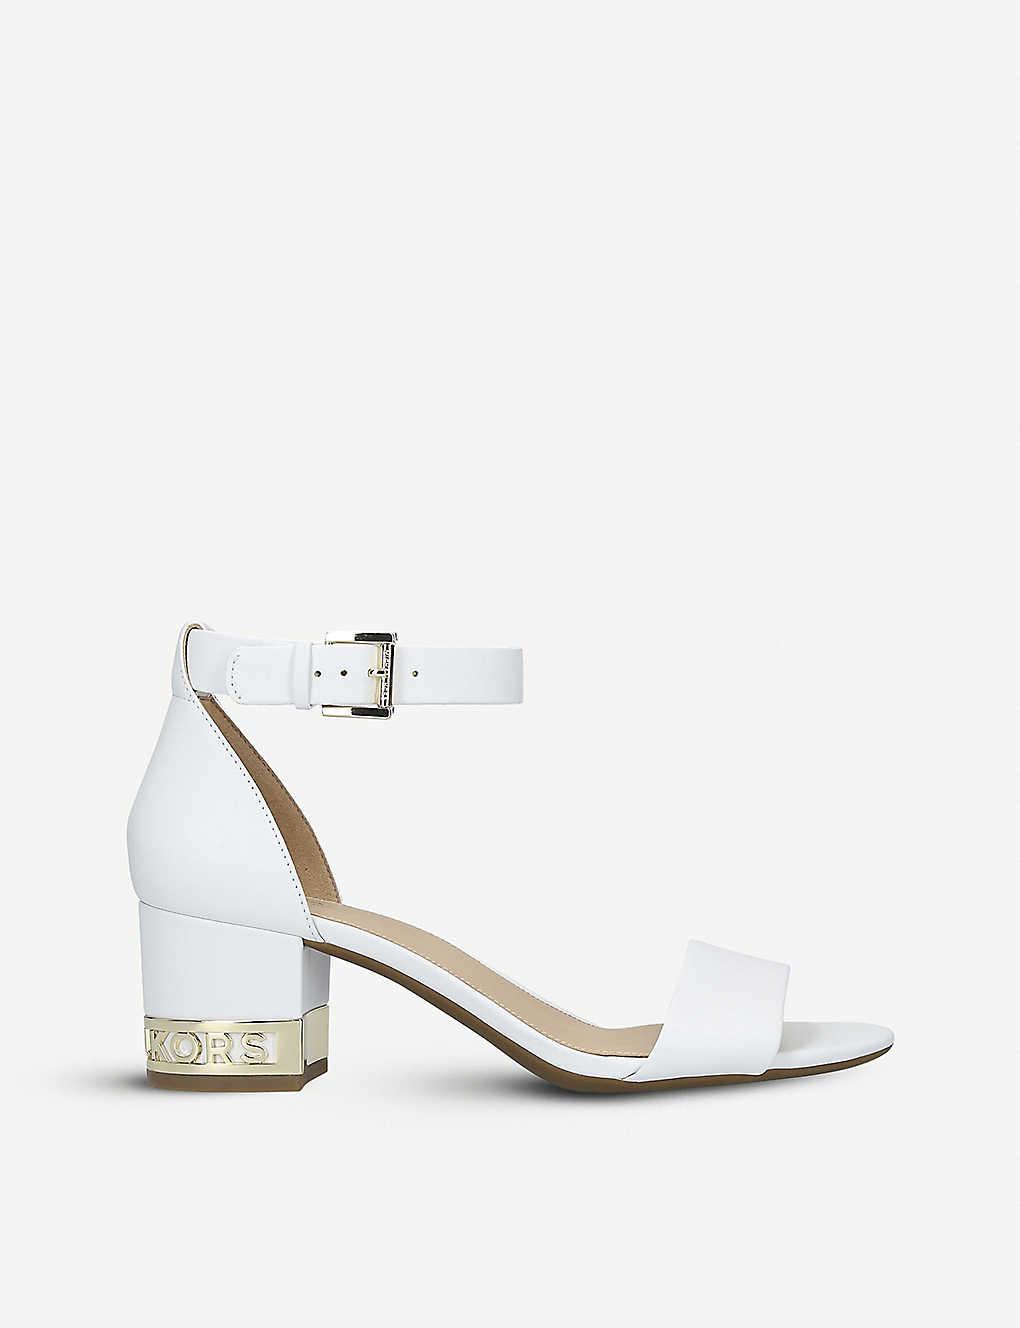 293b21deed MICHAEL MICHAEL KORS - Portia flex block heel leather sandals ...